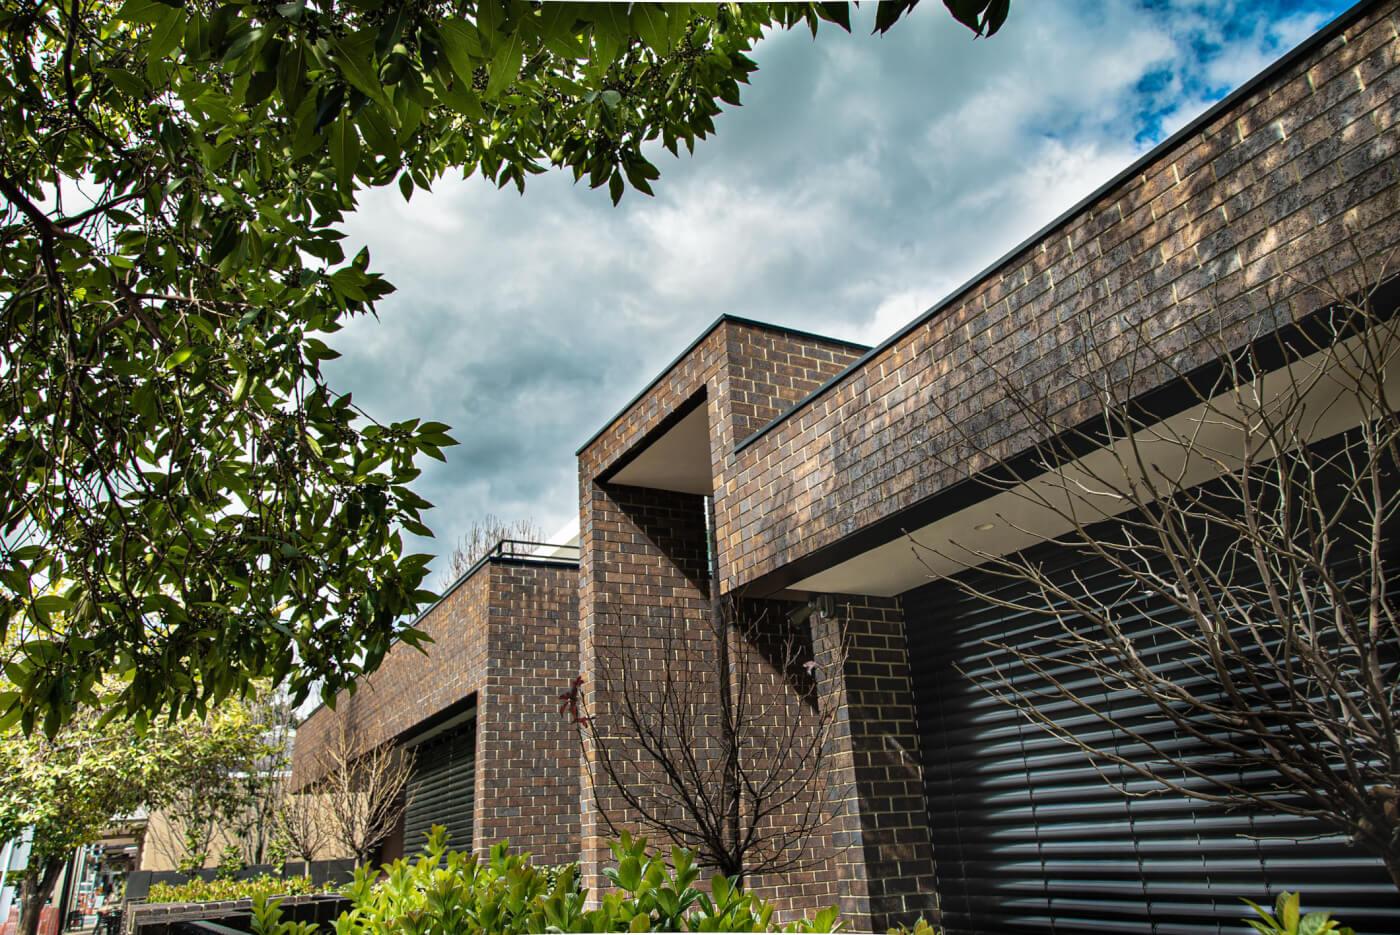 Coachhouse Brick 76mm Hyde Park Littlehampon Bricks And Pavers Reduced 4